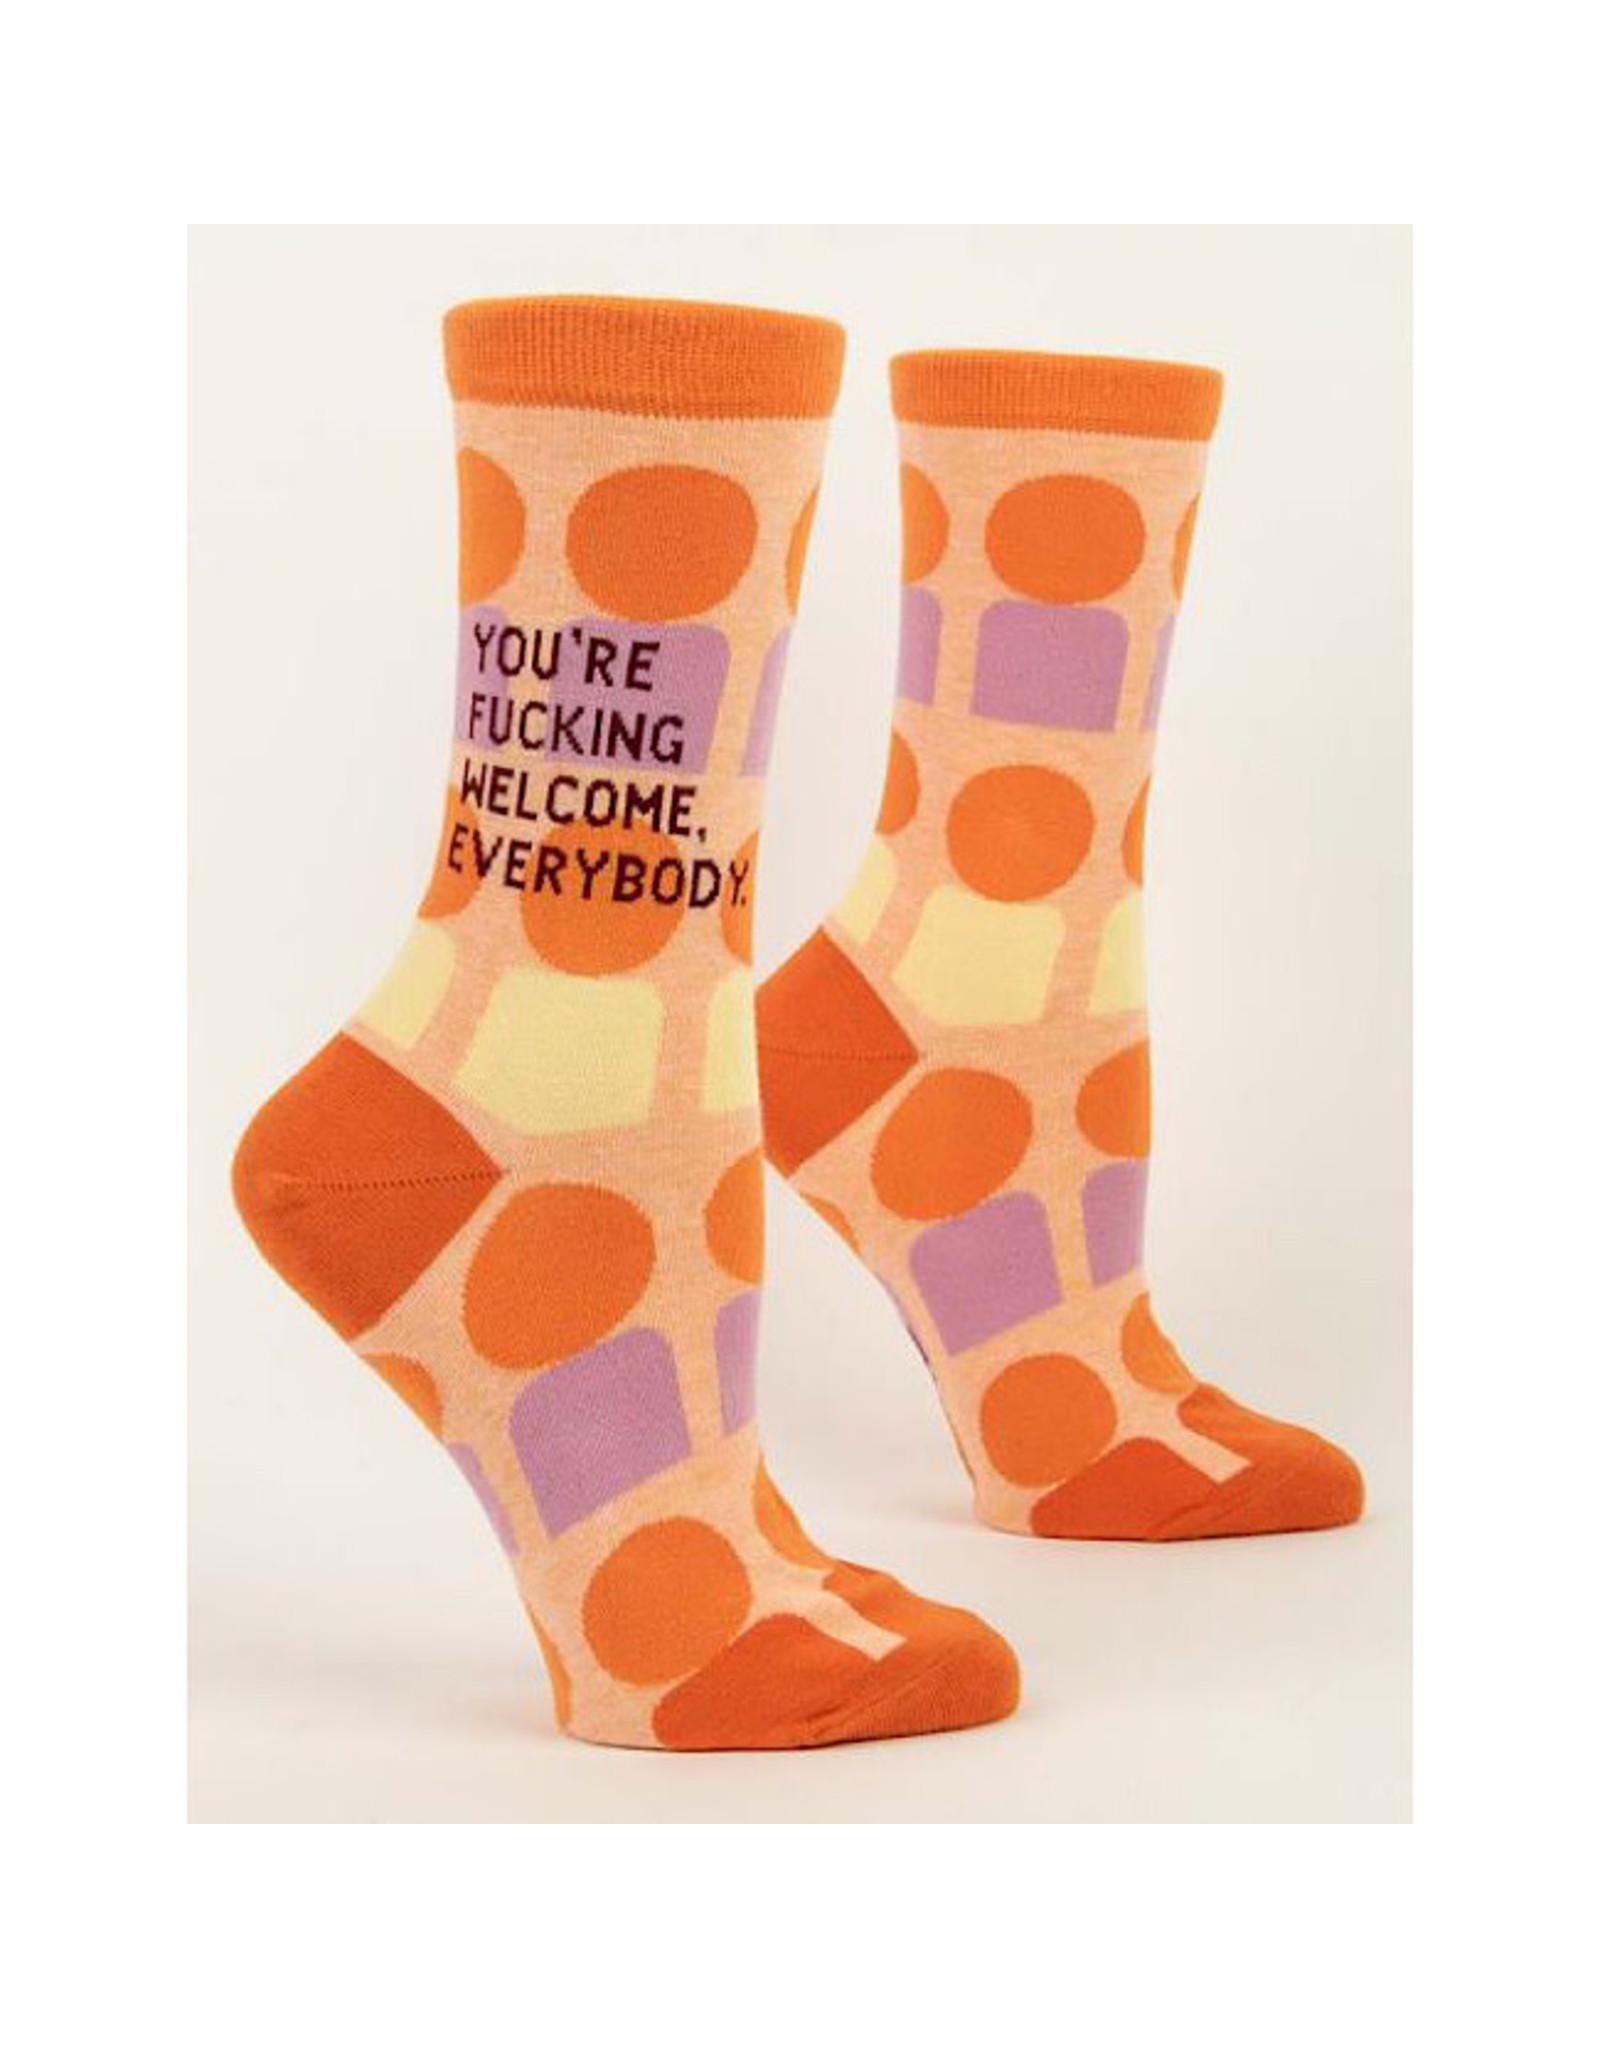 Socks (Womens) - You're Fucking Welcome Everybody